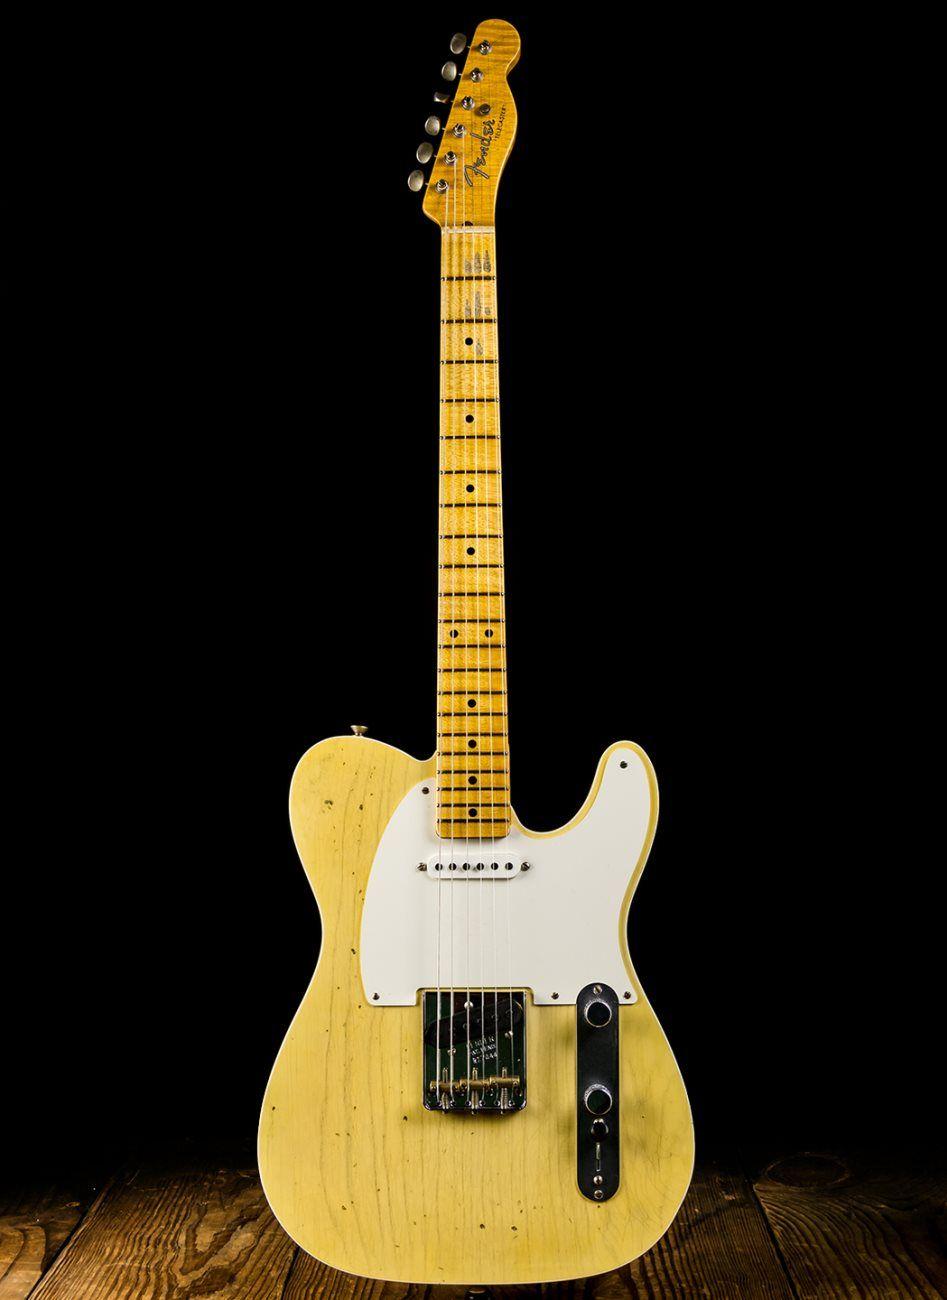 Fender 50s Journeyman Relic Telecaster Super Faded Nocaster Blonde Guitar Telecaster Fender Telecaster